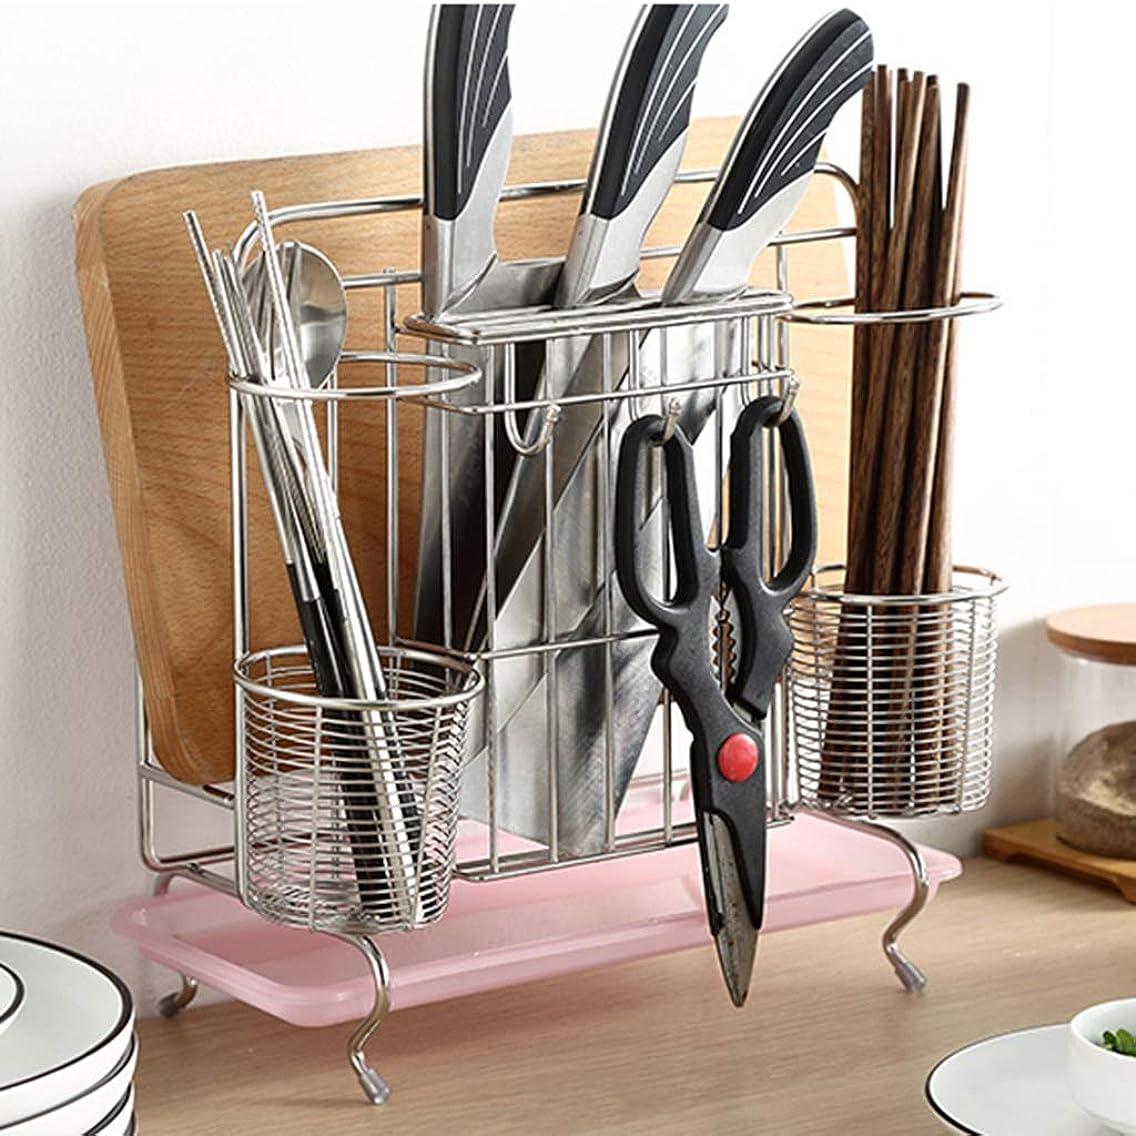 IUYWL ドレンラック、キッチンステンレス箸収納ドレンバスケット、多機能ラック-ウォールマウント キッチンドレンラック (Color : Silver)